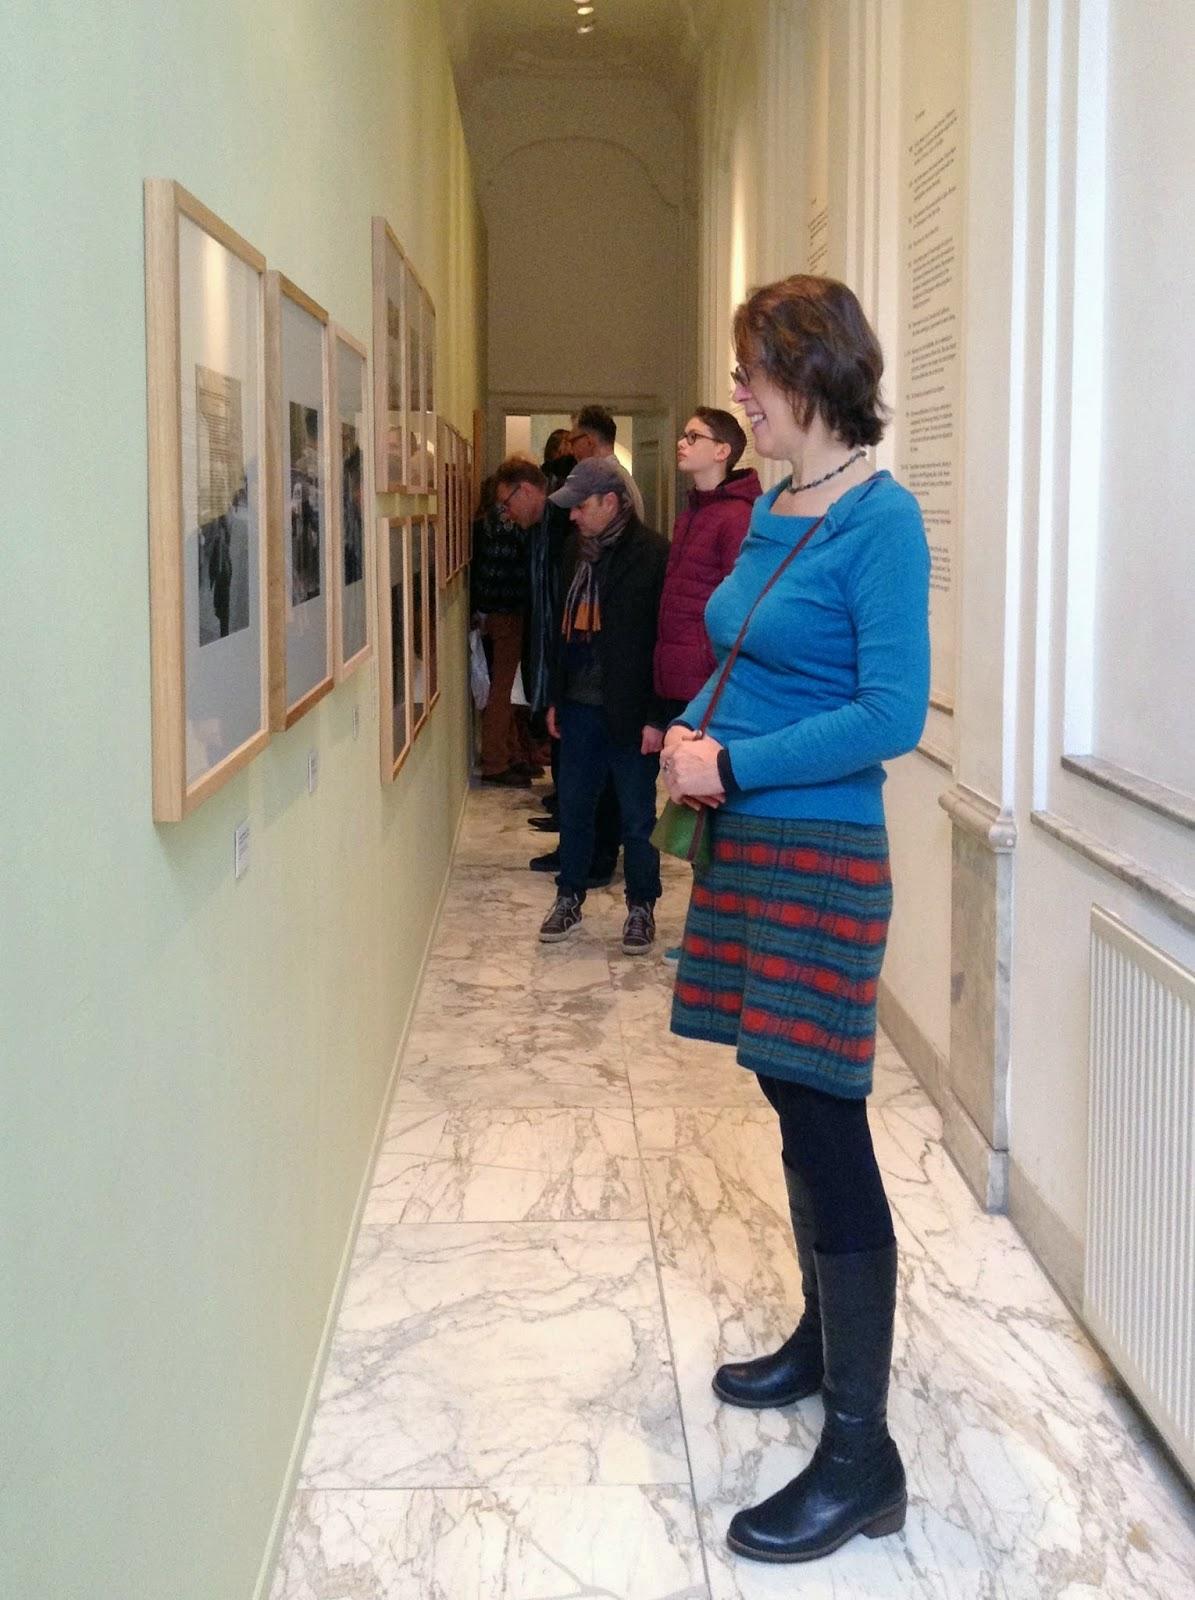 entrance of exhibition: Vivian Maier, Street Photographer